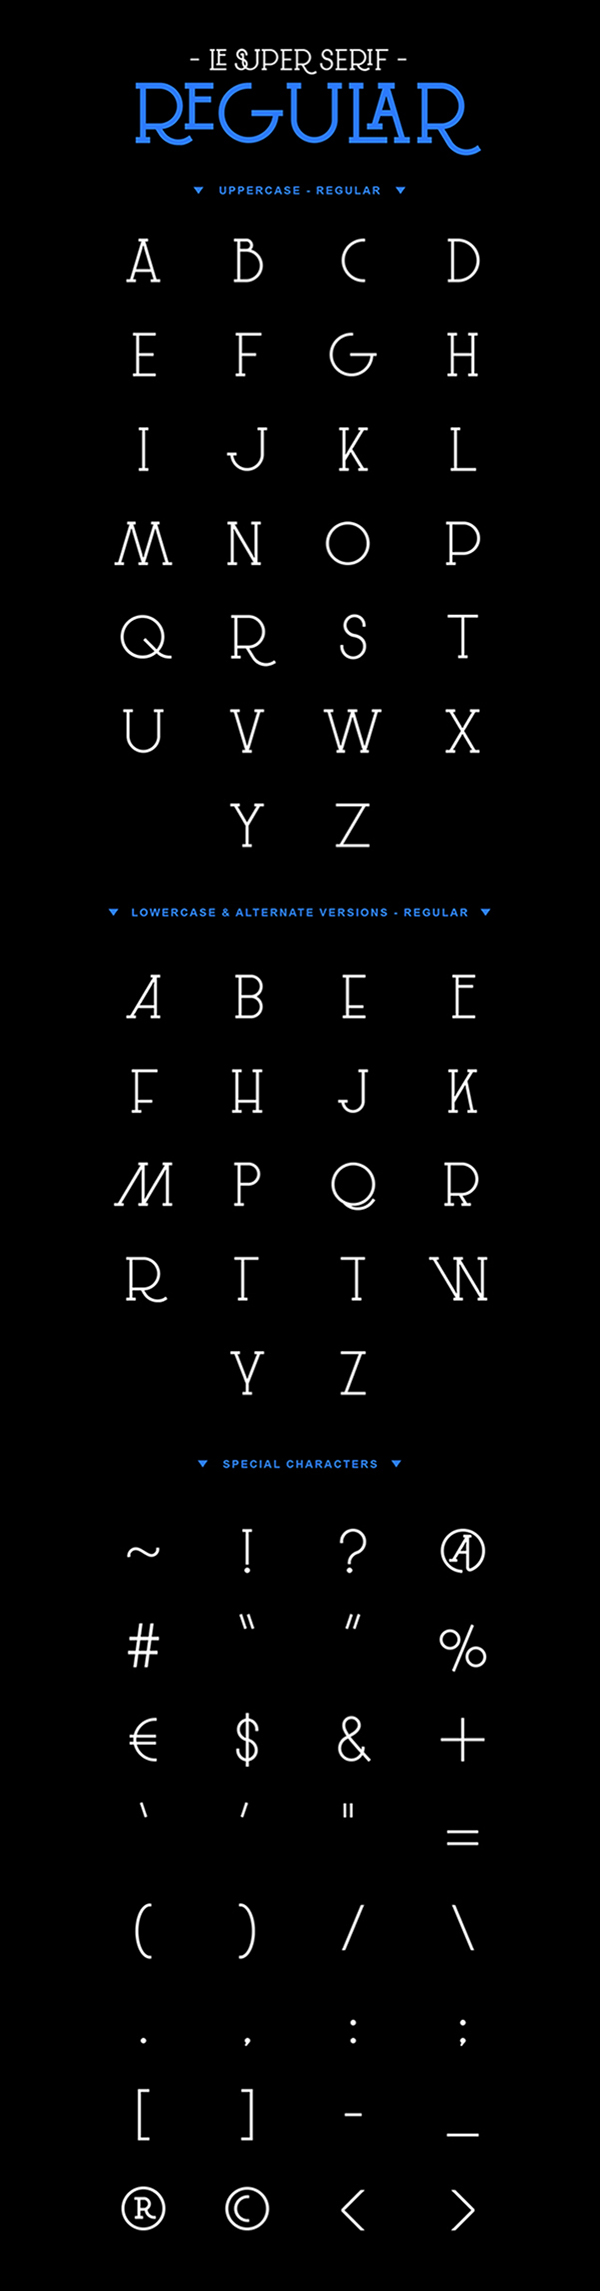 typedesign,Typeface,free,font,Ligatures,dutch,thijs,janssen,Rotterdam,serif